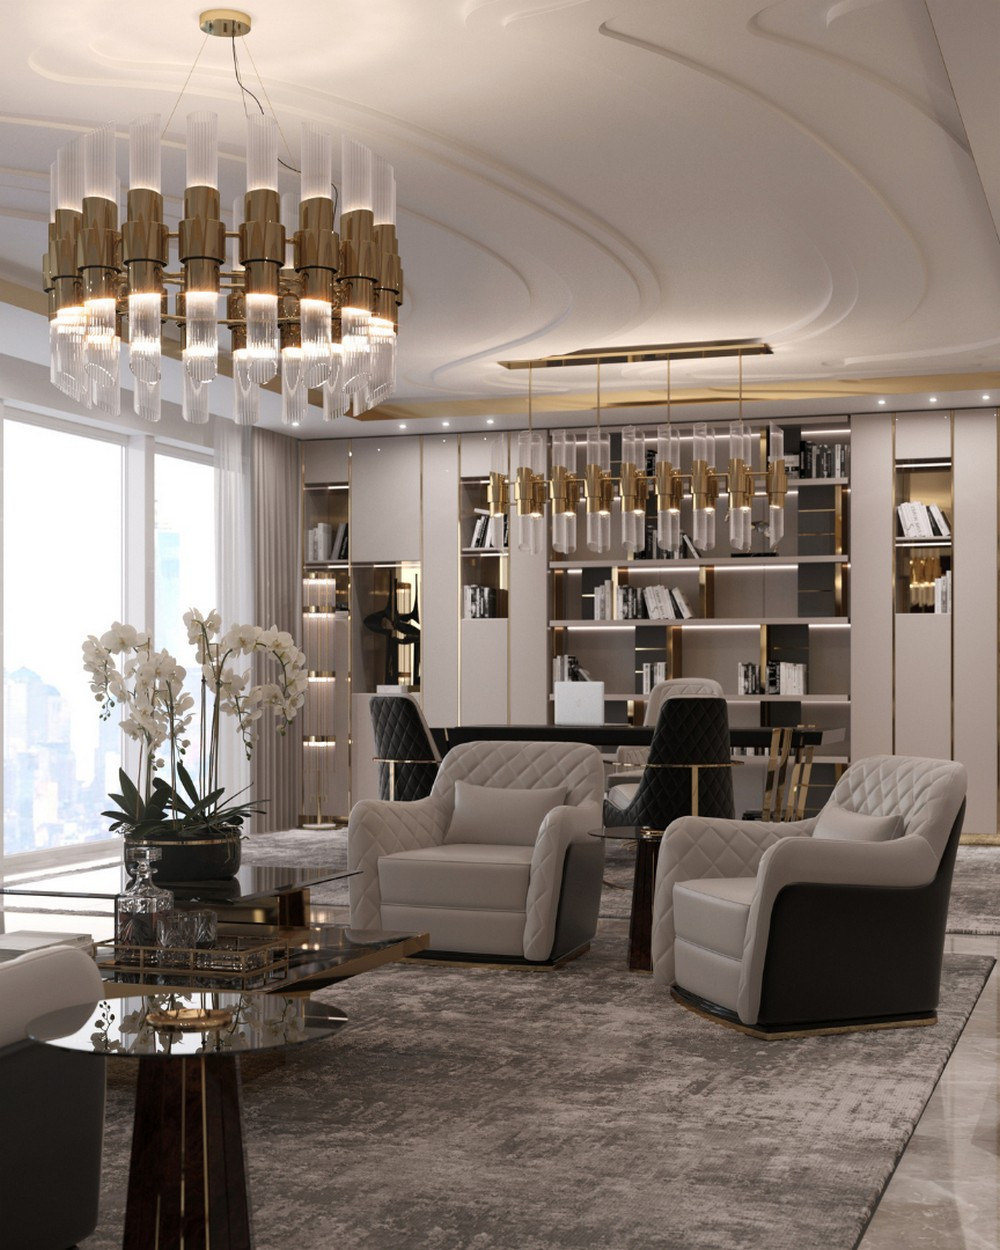 Sala de estar: Inspiraciónes de Diseño de interiores lujuoso